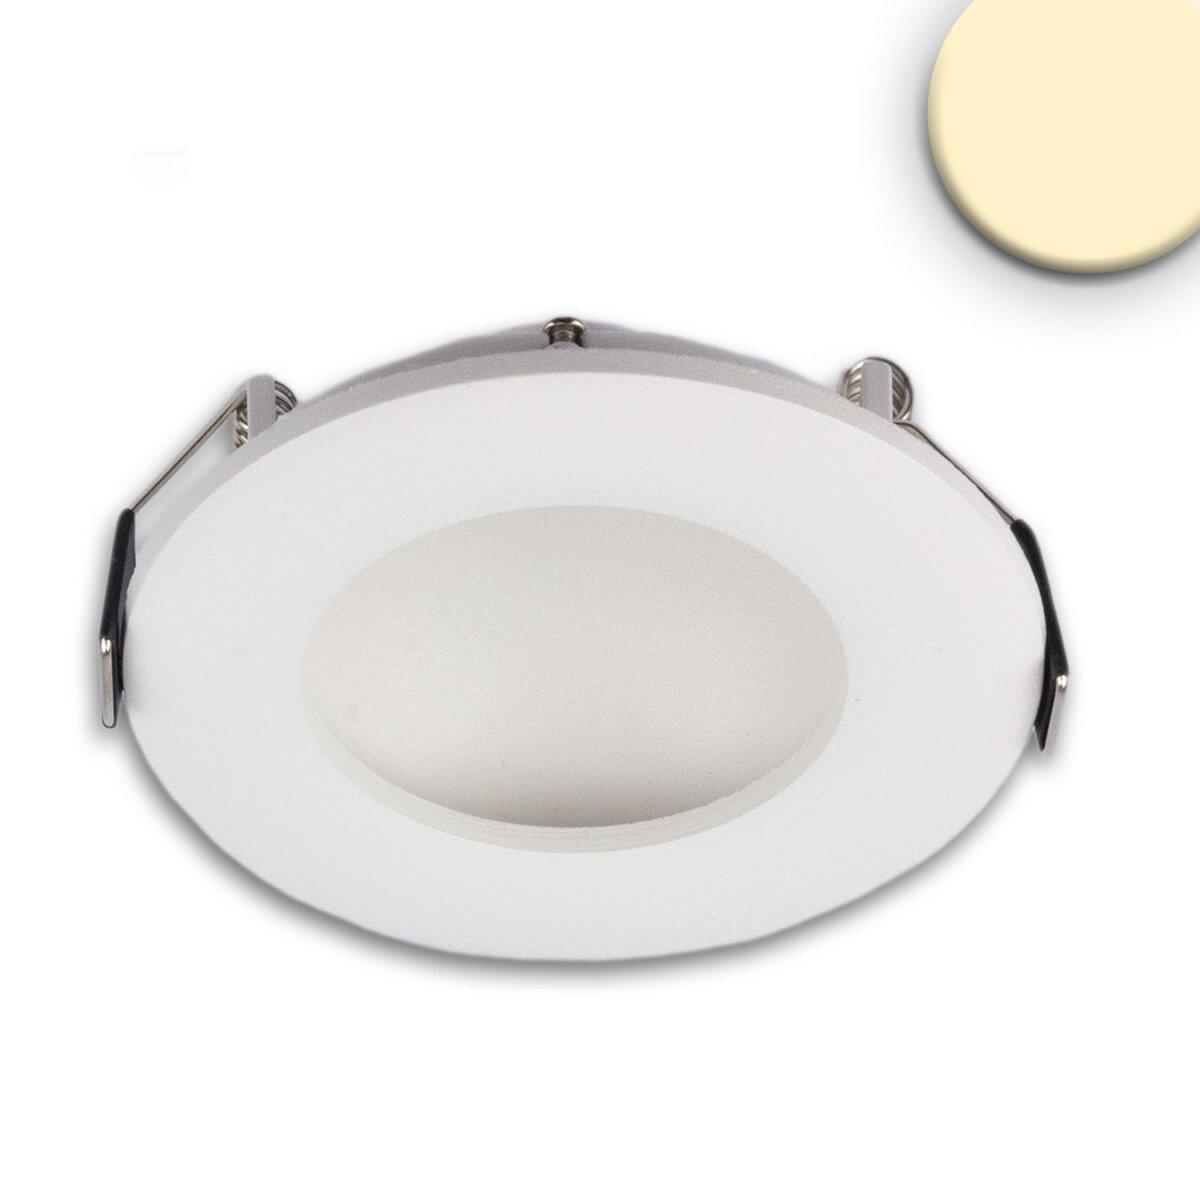 led downlight luna indirektes licht 8w warmwei. Black Bedroom Furniture Sets. Home Design Ideas